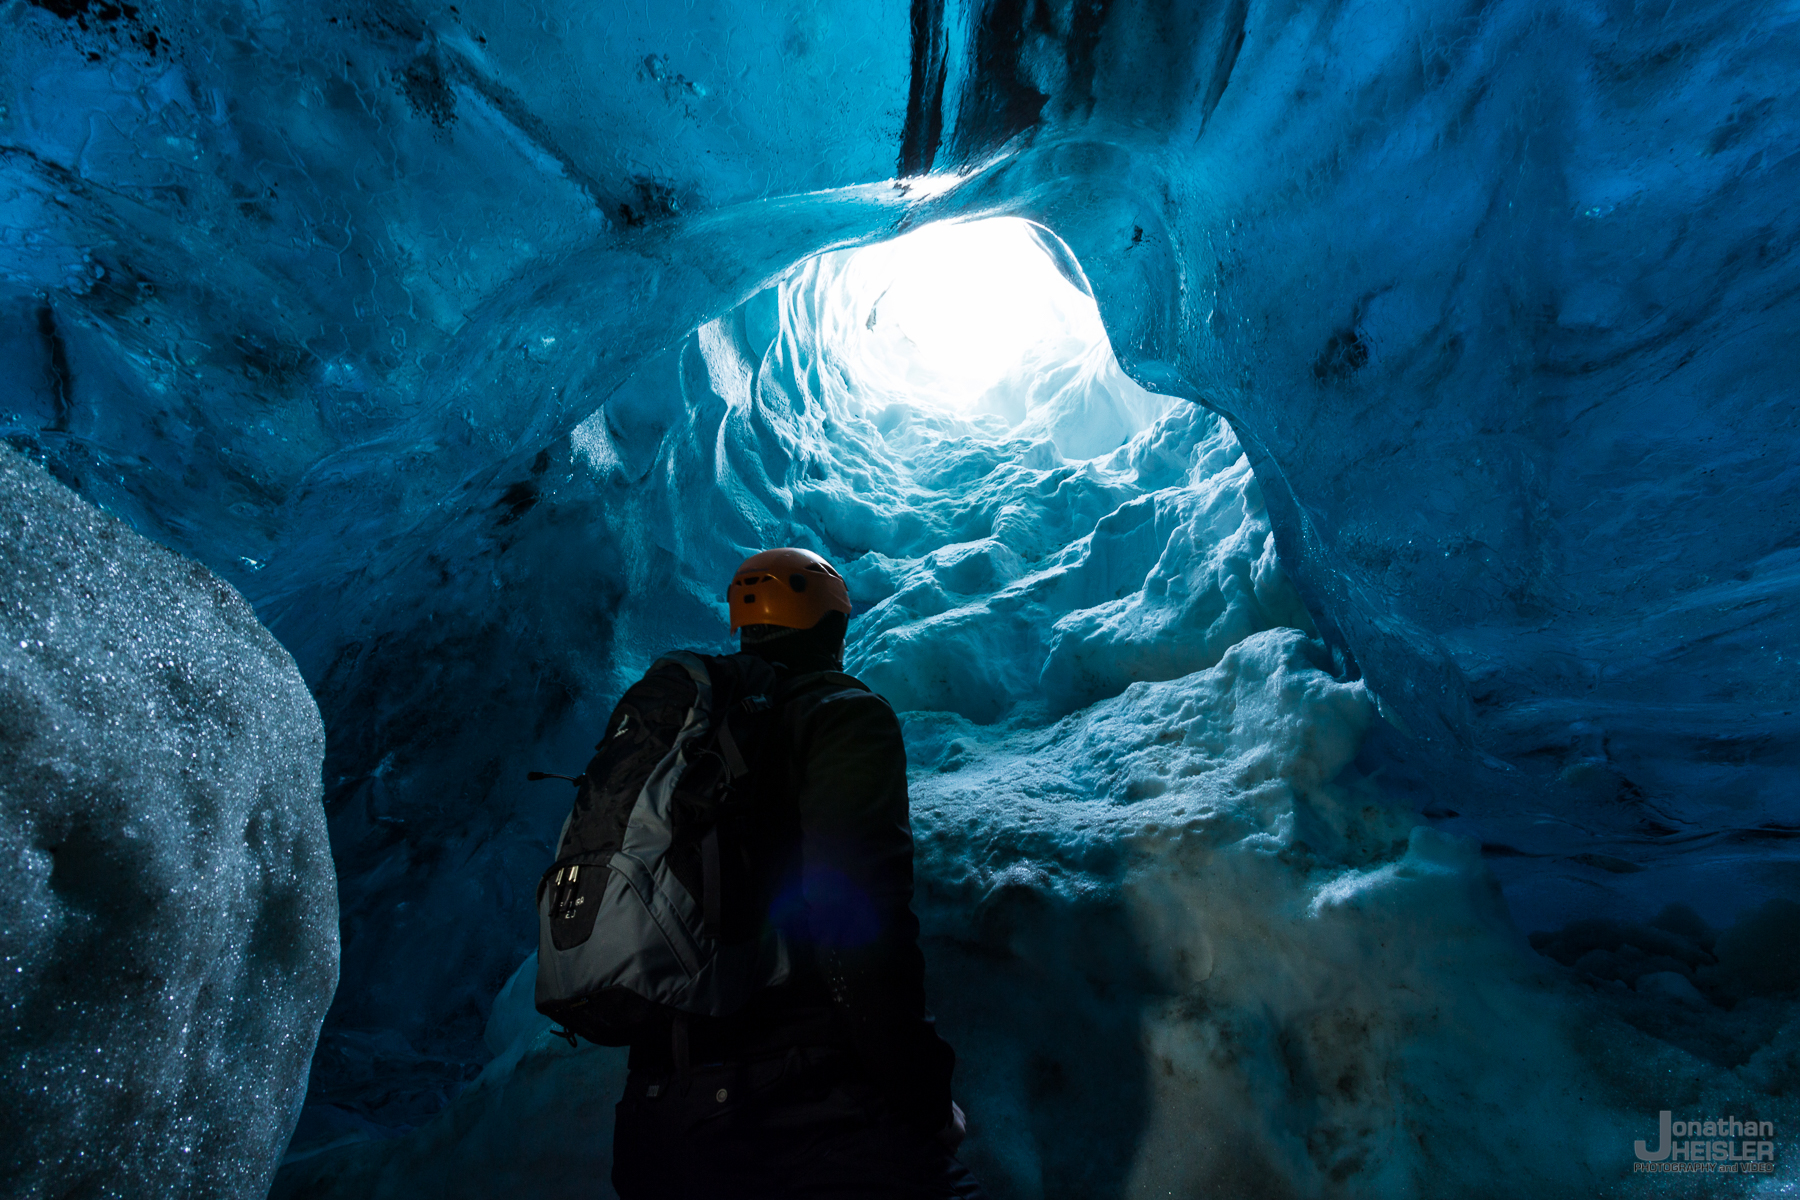 Iceland Winter Photos_  Jonathan Heisler __  02292016 _ 011.jpg